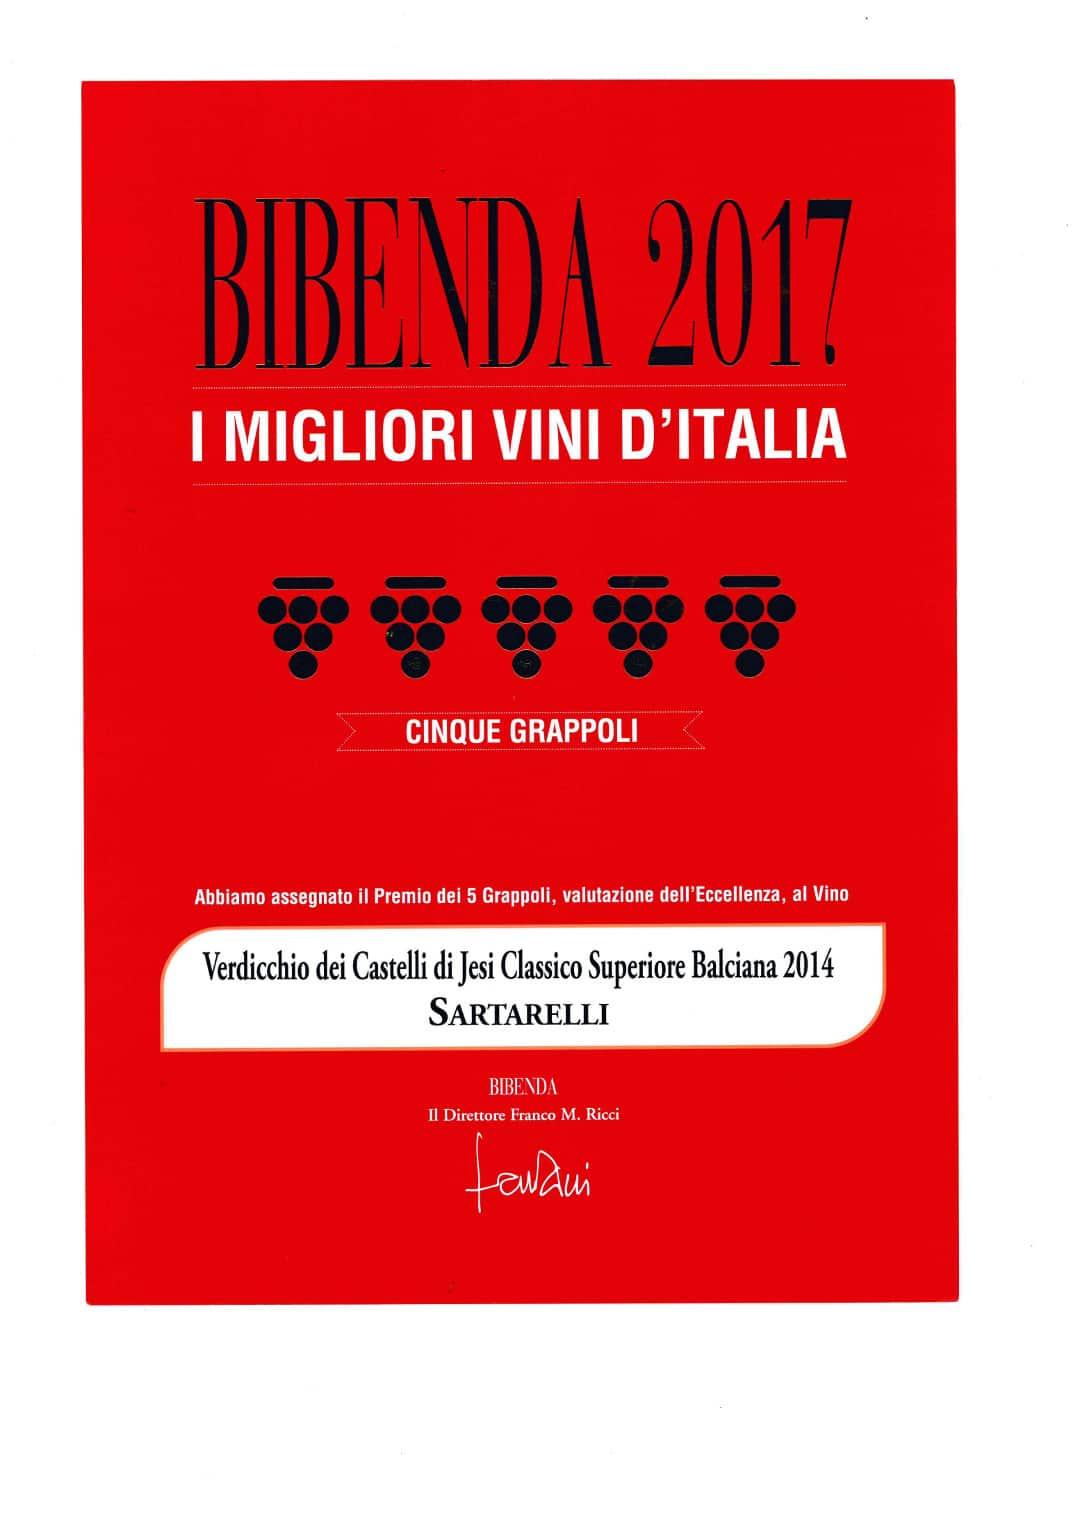 Balciana 2014 - 5 Grappoli - Bibenda 2017